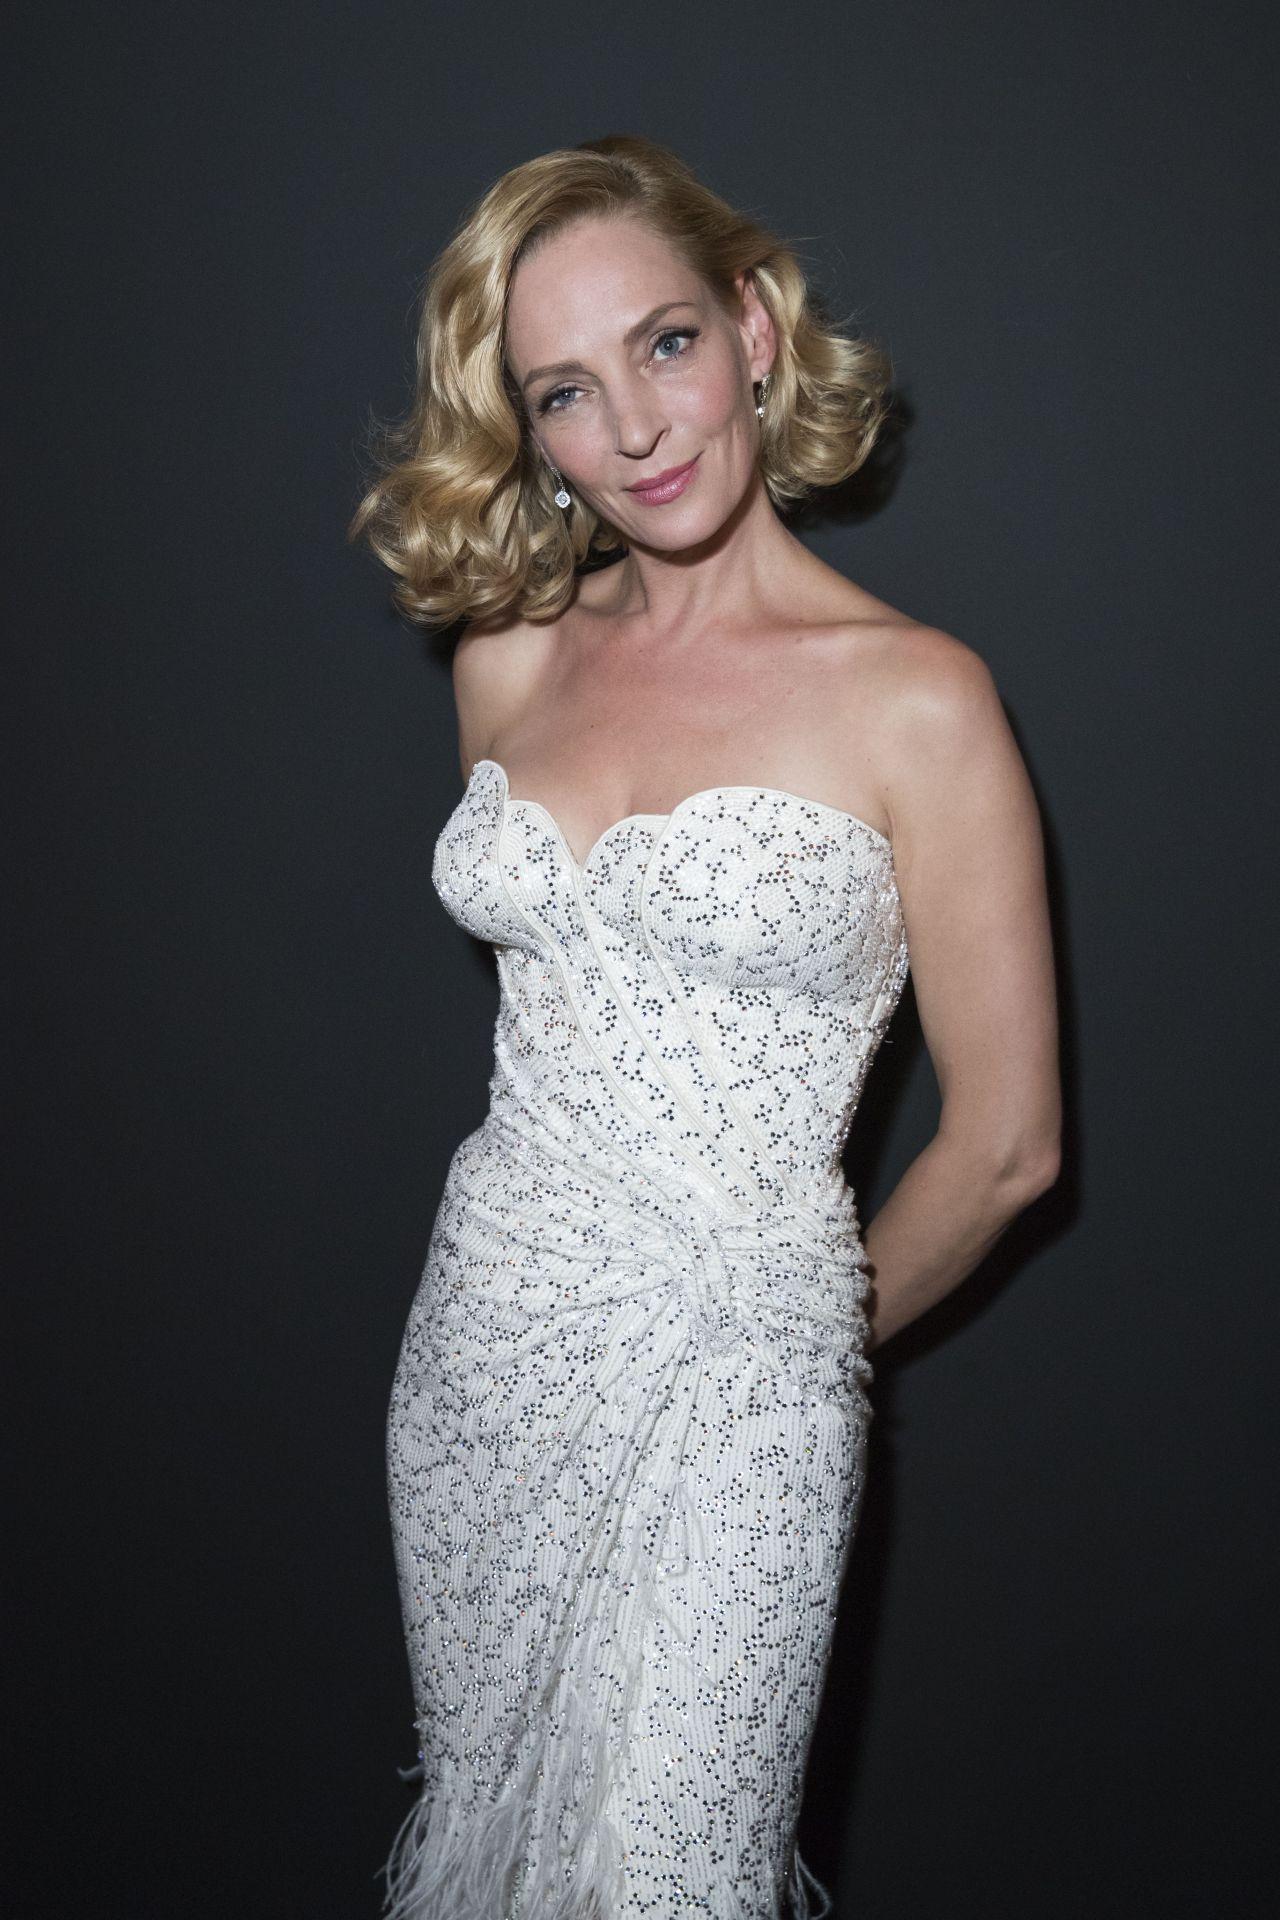 Uma Thurman At Kering Women In Motion Awards Cannes Film